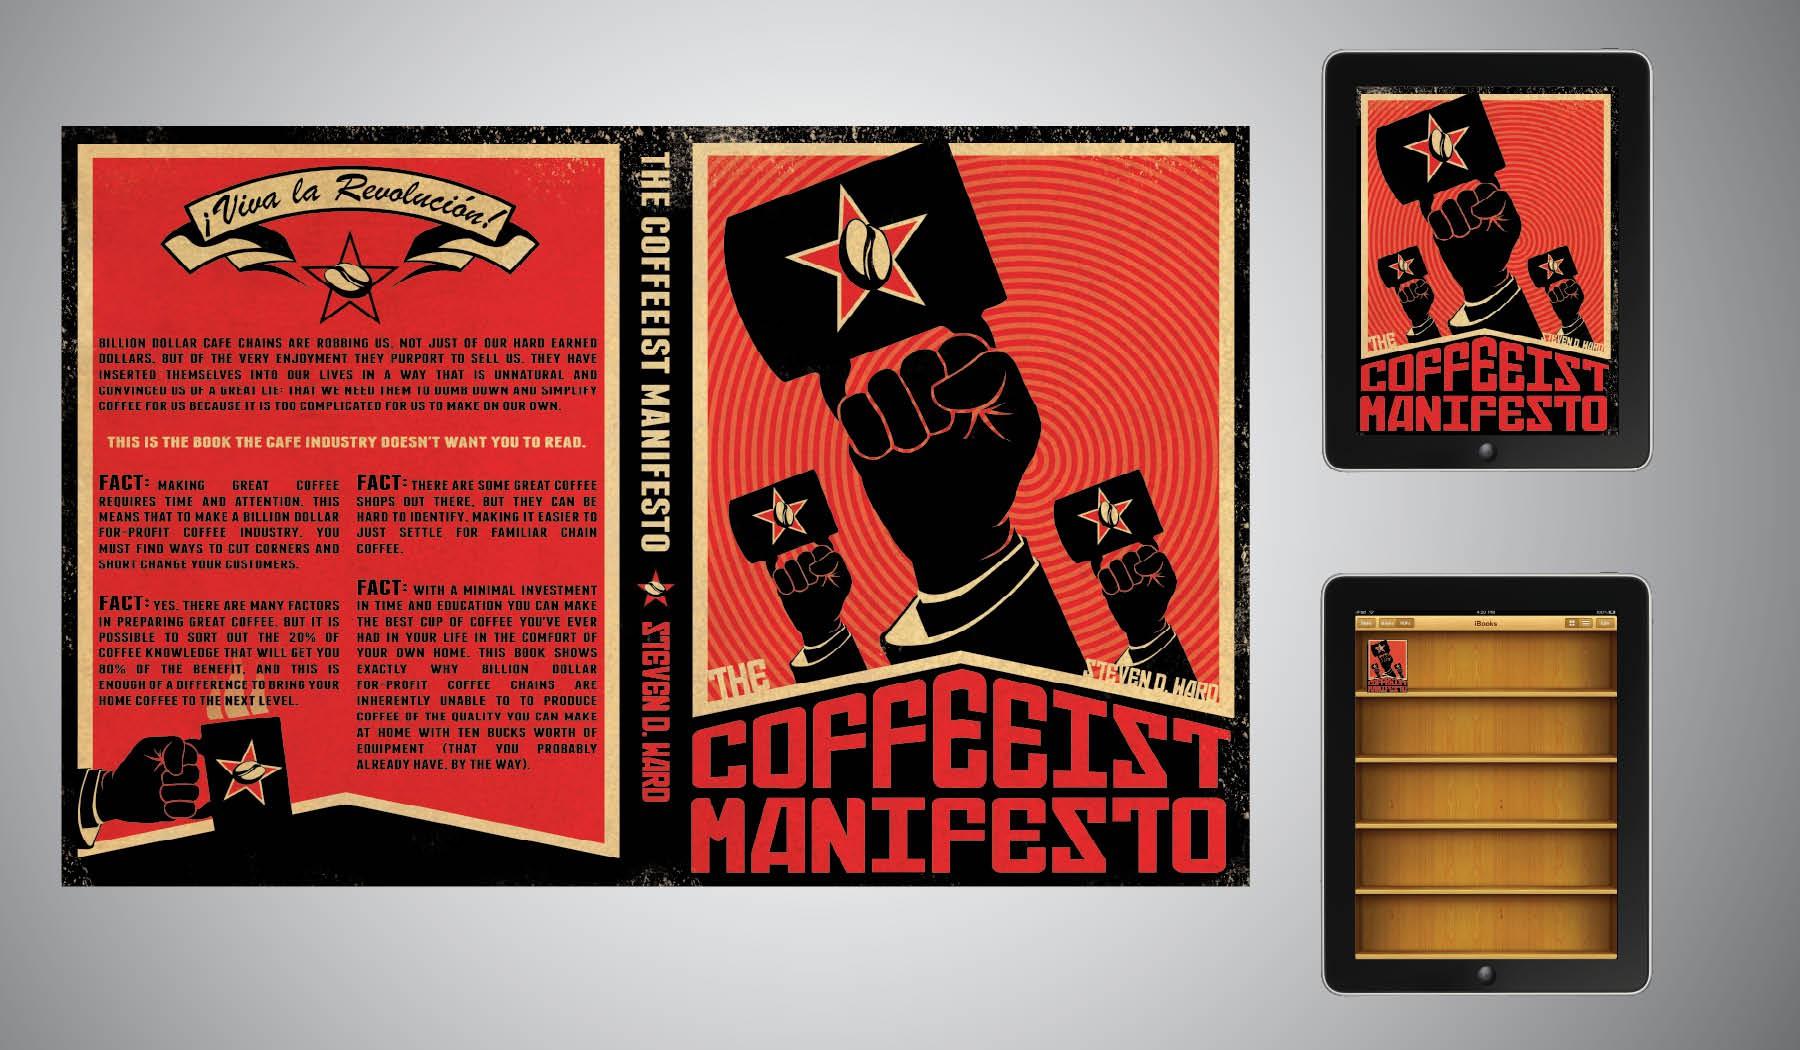 book or magazine cover for The Coffeeist Manifesto